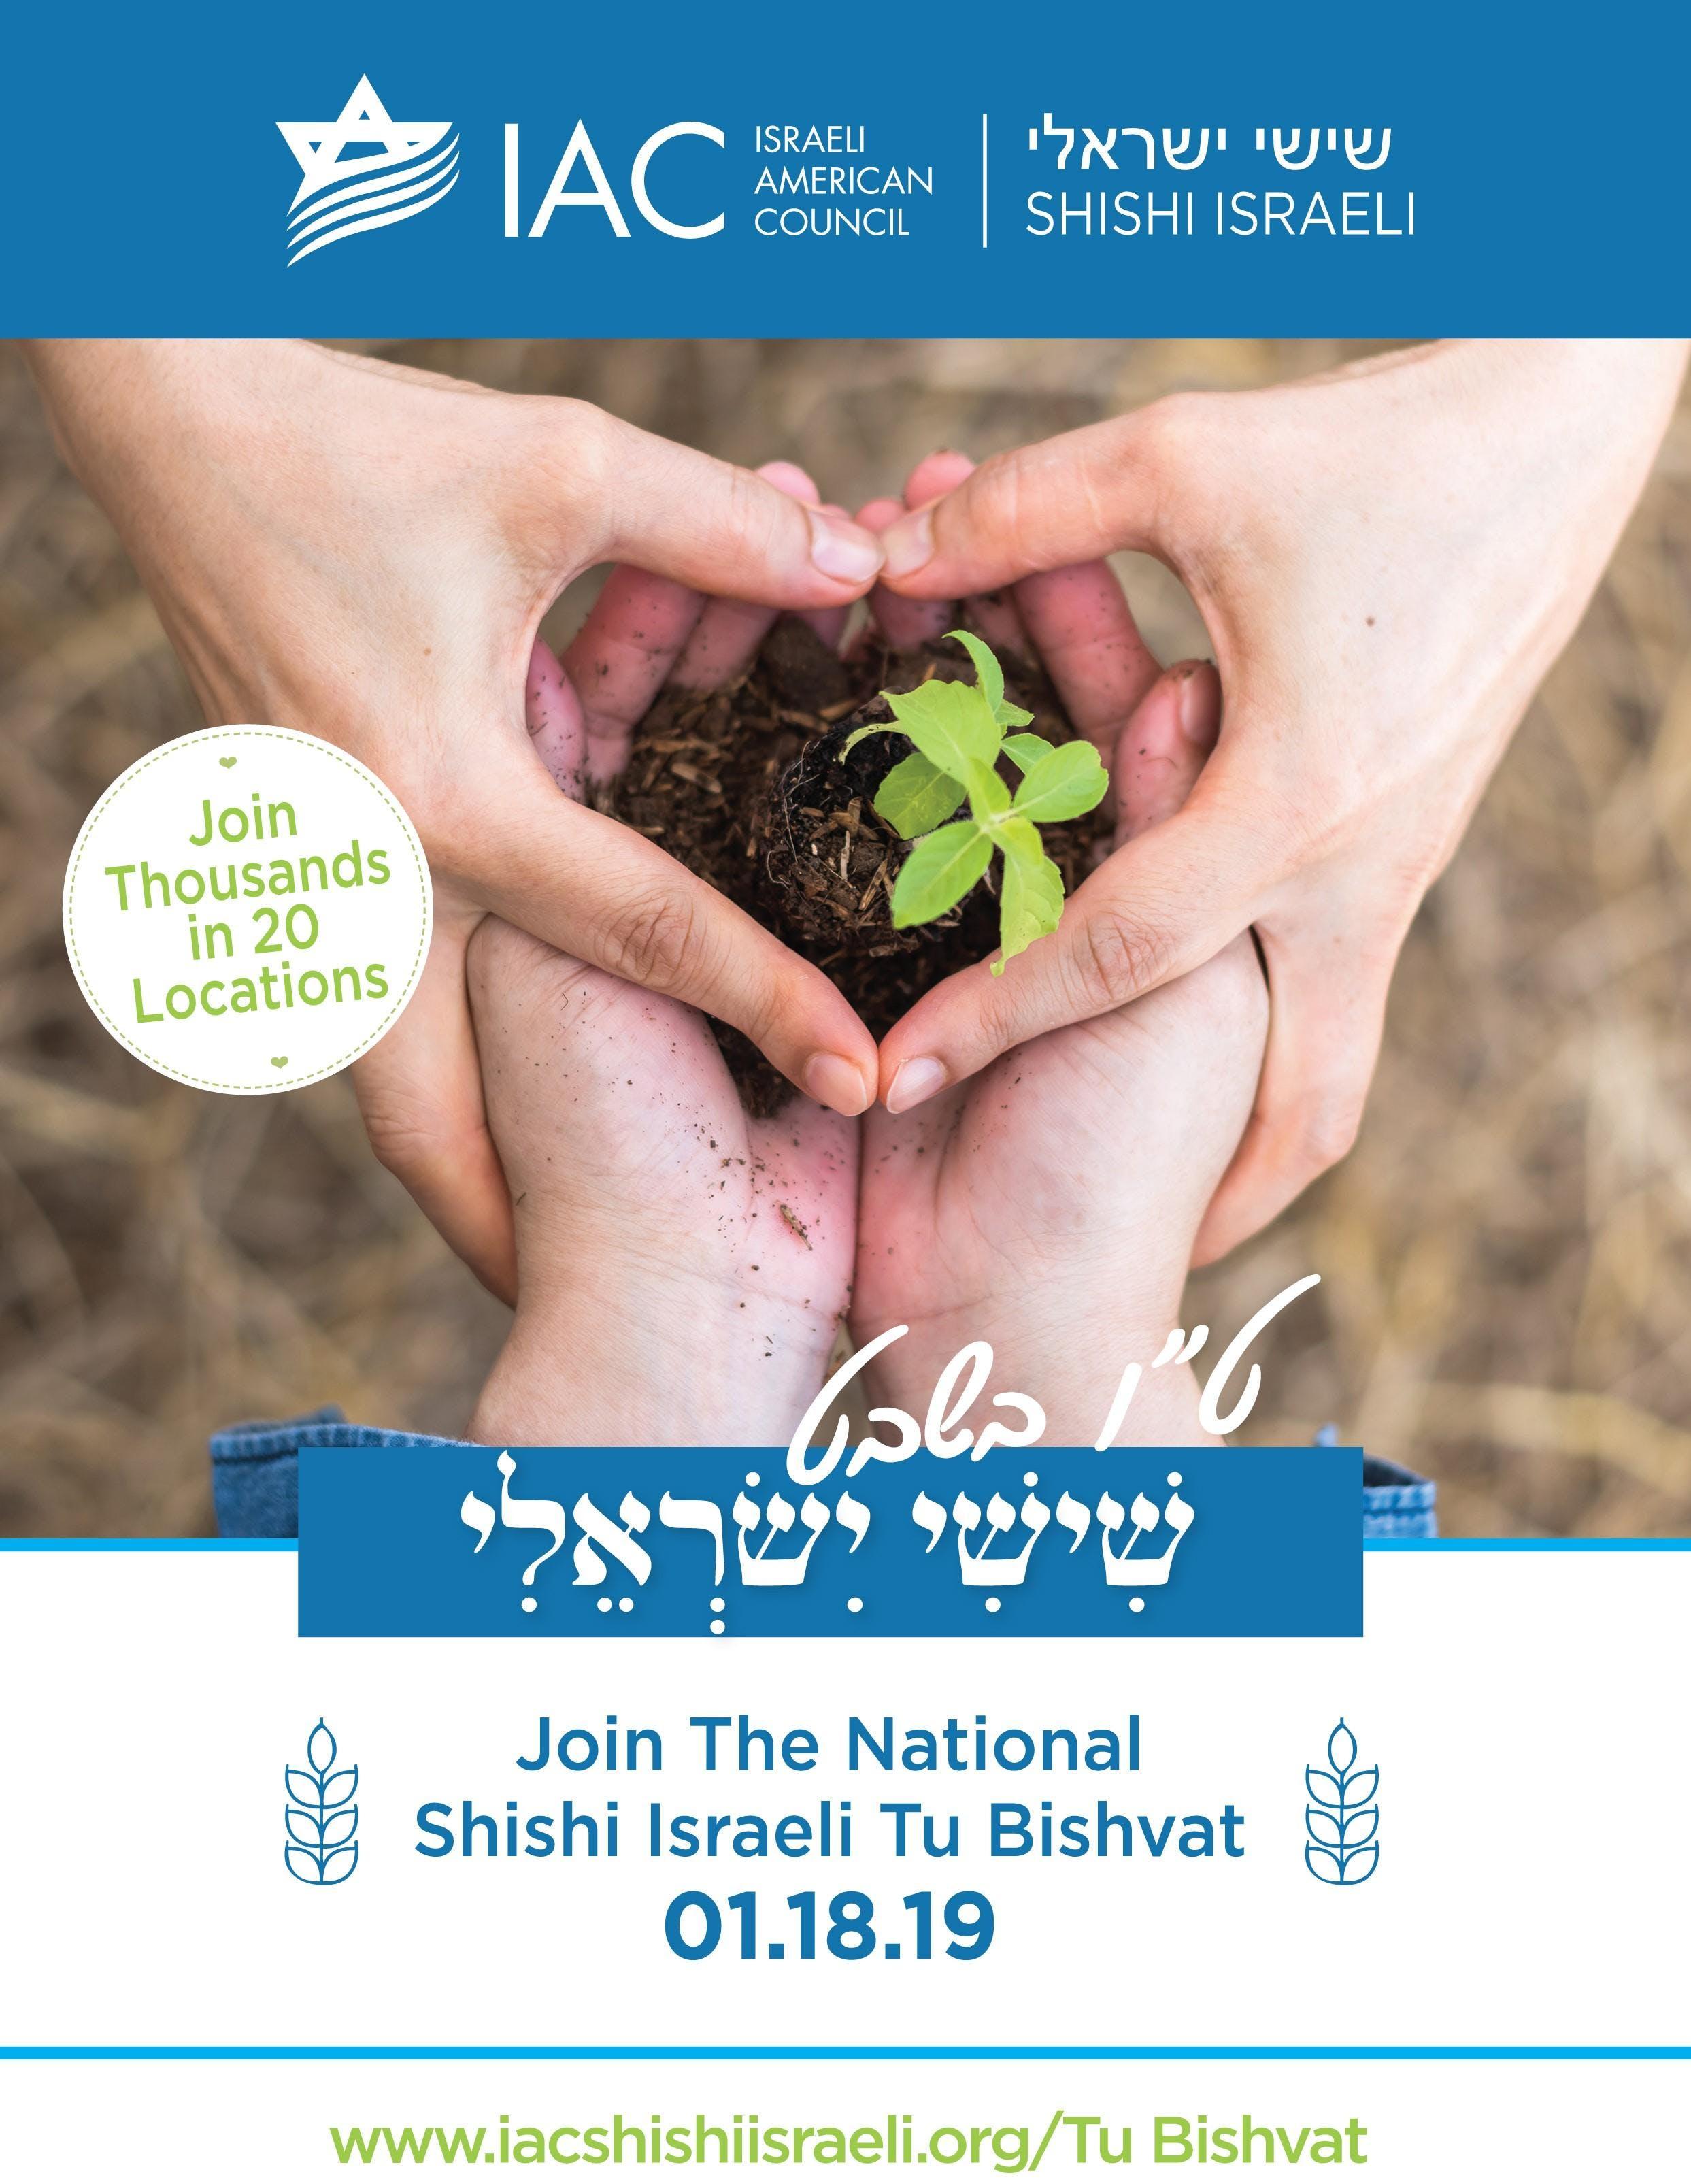 SHISHI ISRAELI CELEBRATE TU BISHVAT